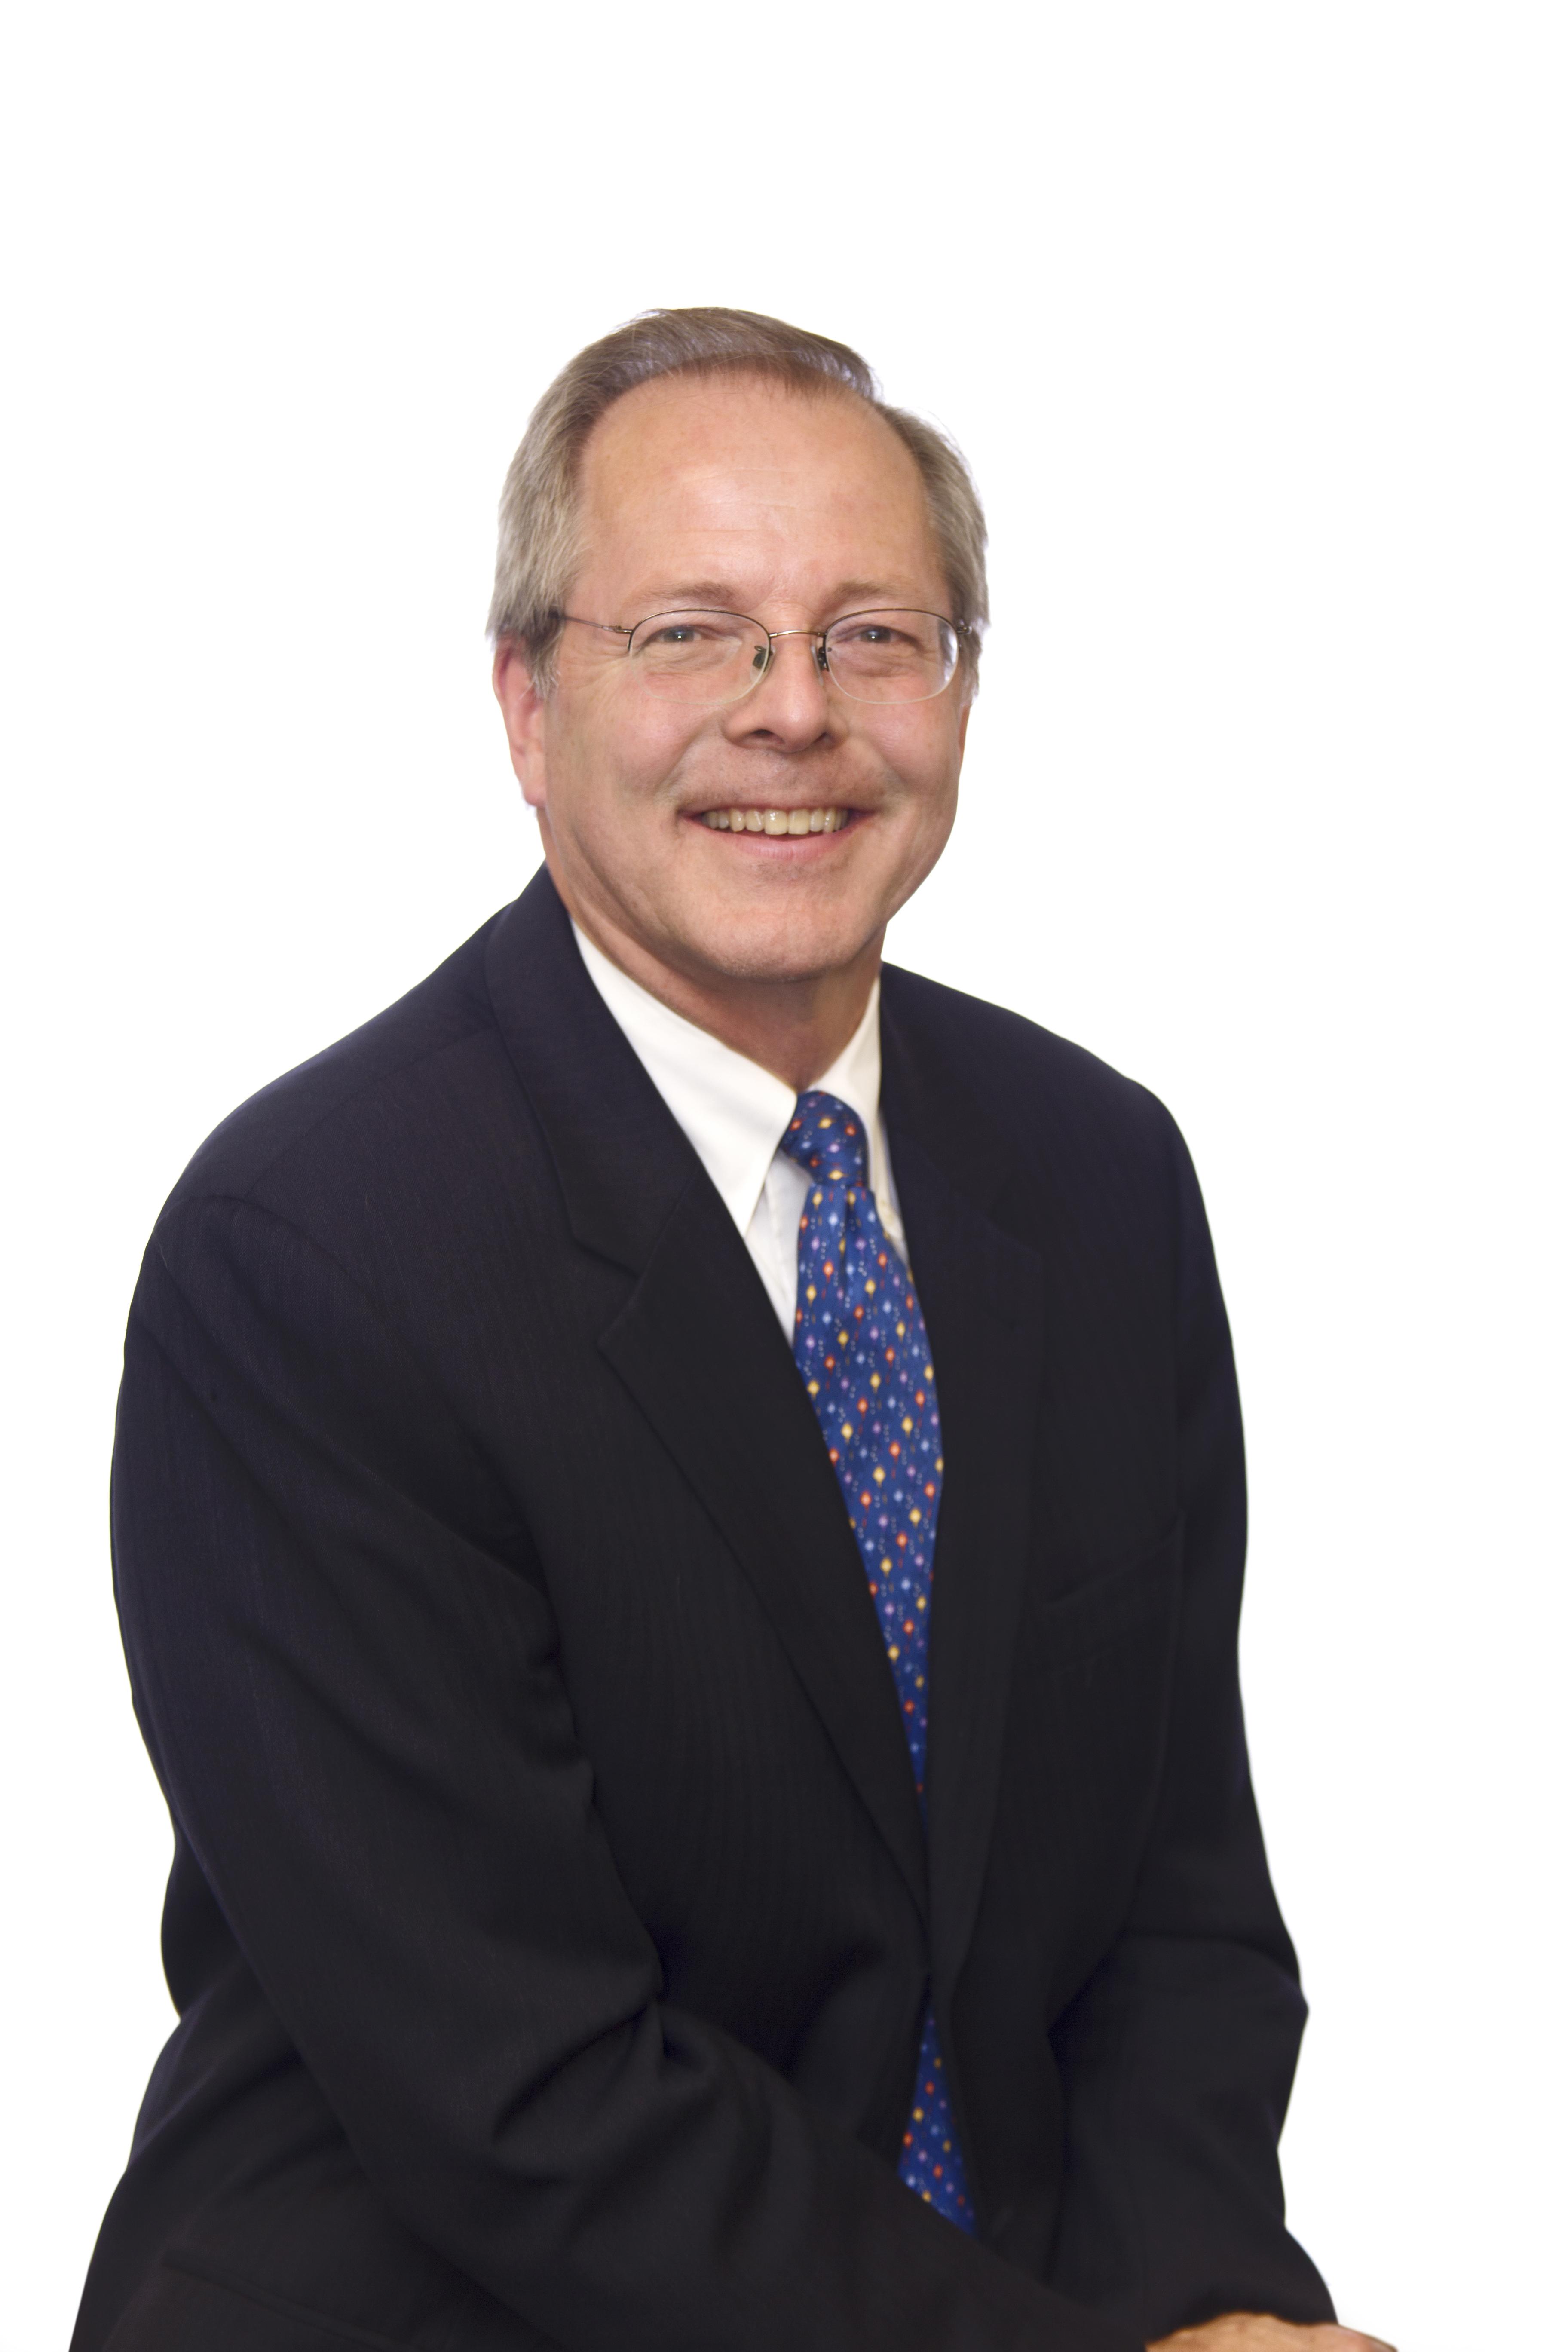 William J. Merritt, president and CEO of InterDigital